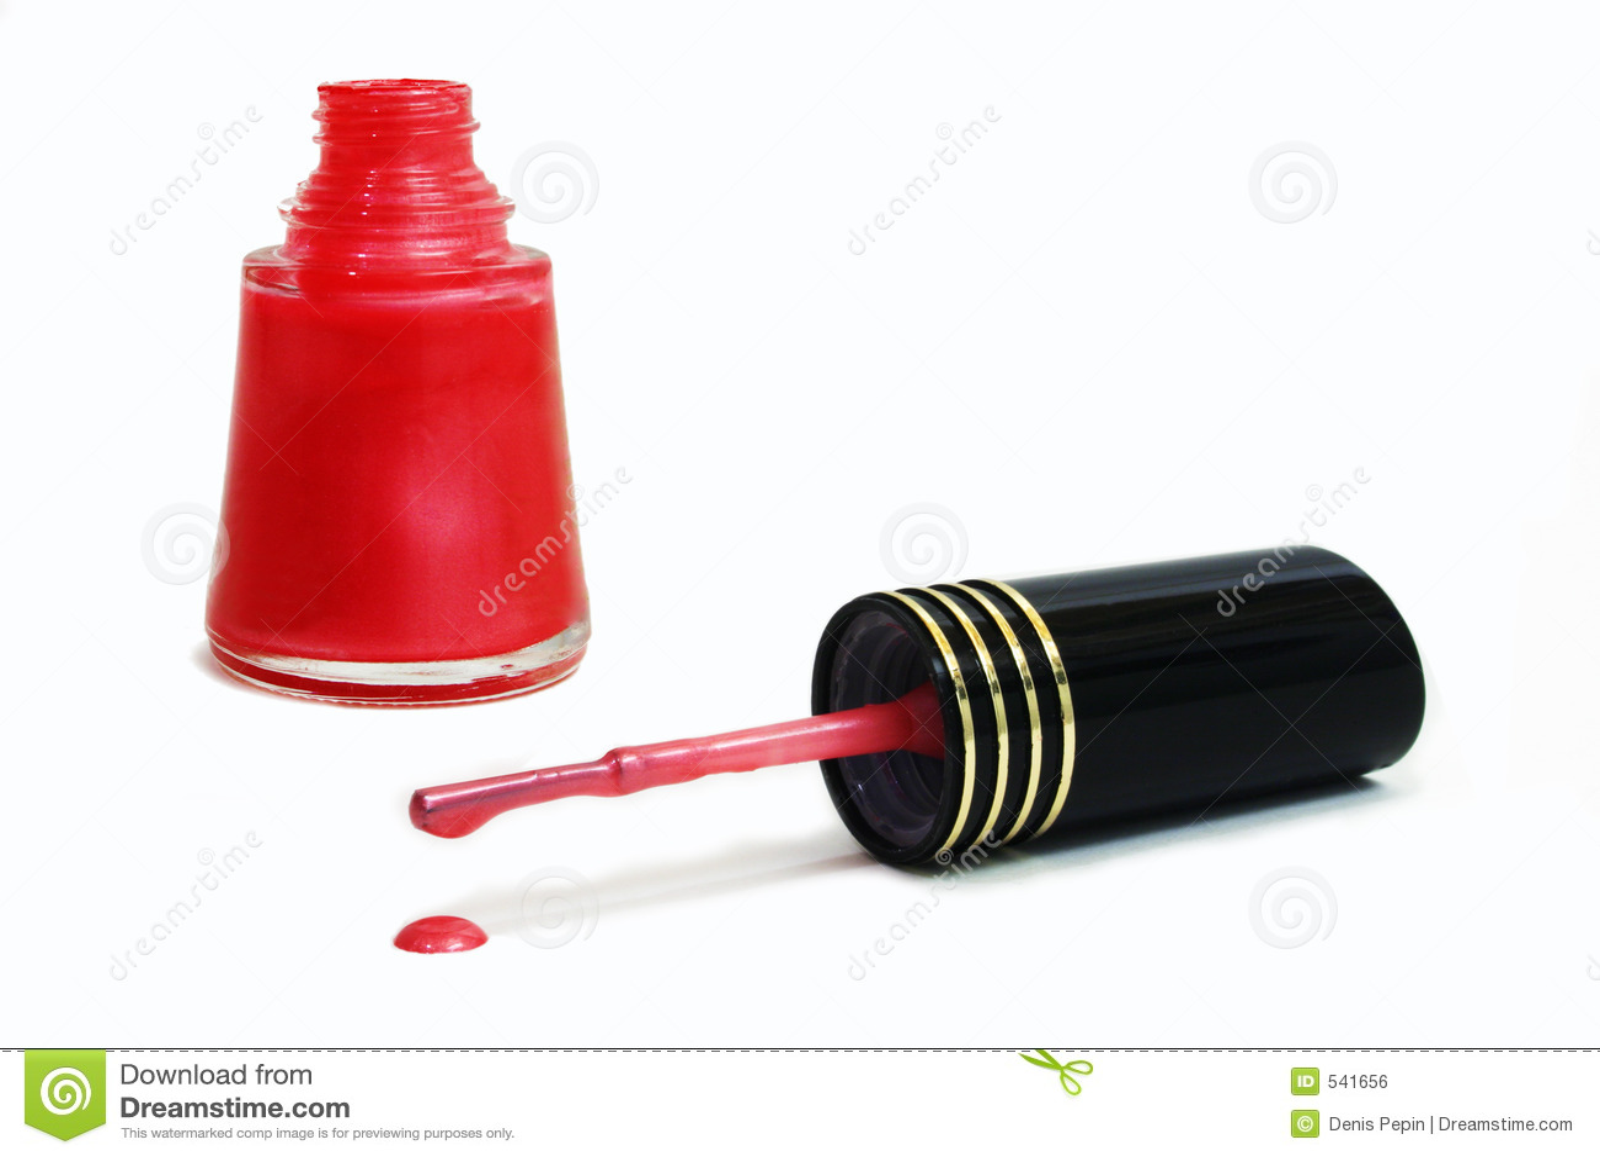 Download 指甲油 库存照片. 图片 包括有 亮漆, 趾甲, 水滴, bothy, 下落, 弄脏, 钉子, 颜色, 红色 - 541656